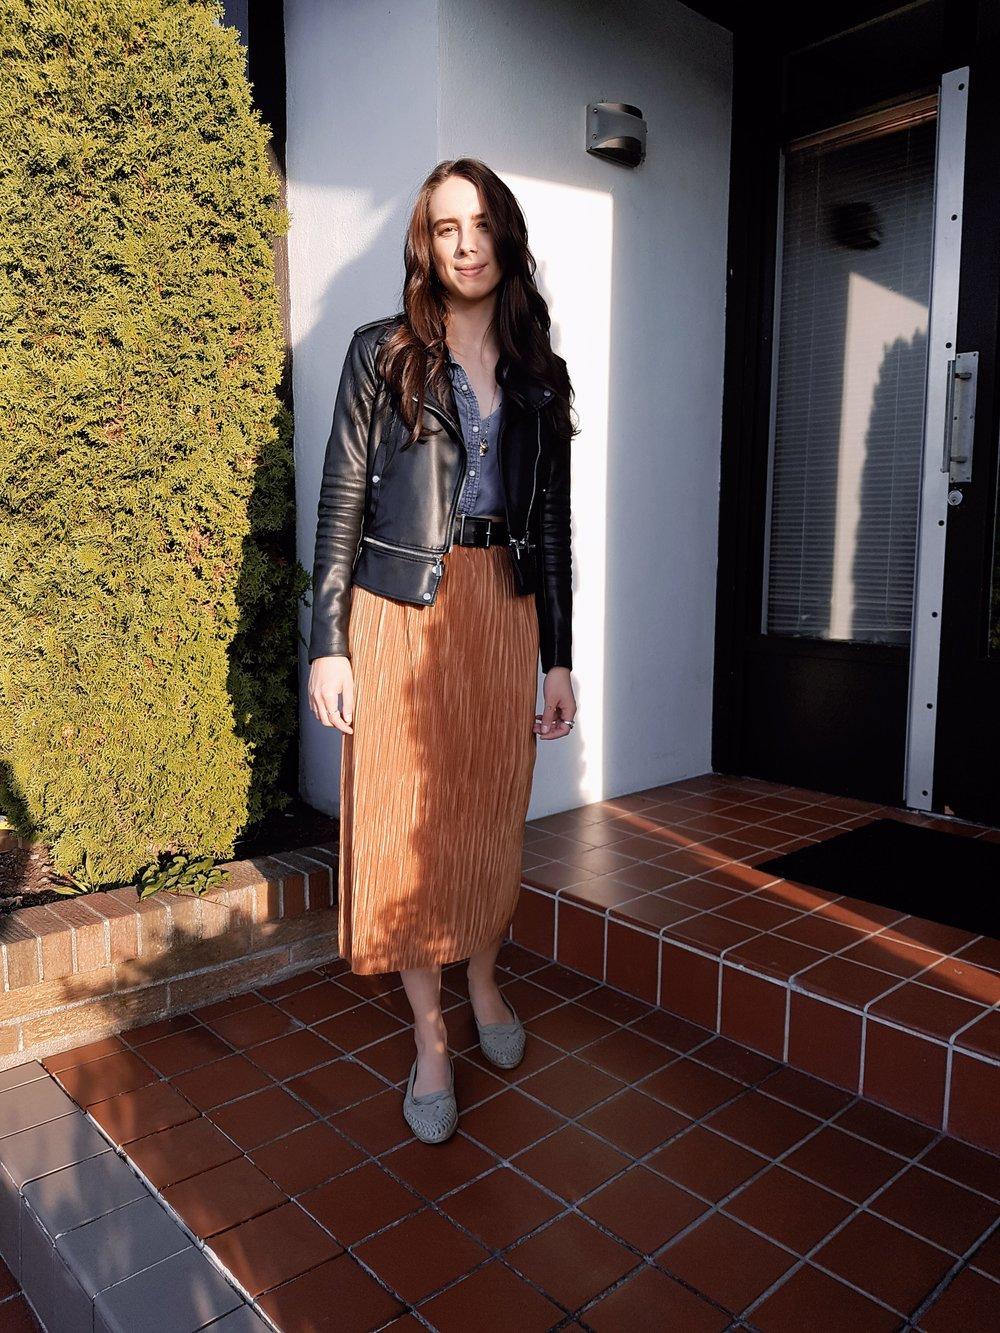 THURSDAY - American Eagle shirt, Dynamite skirt, Zara jacket, Urban Outfitters belt, vintage shoes